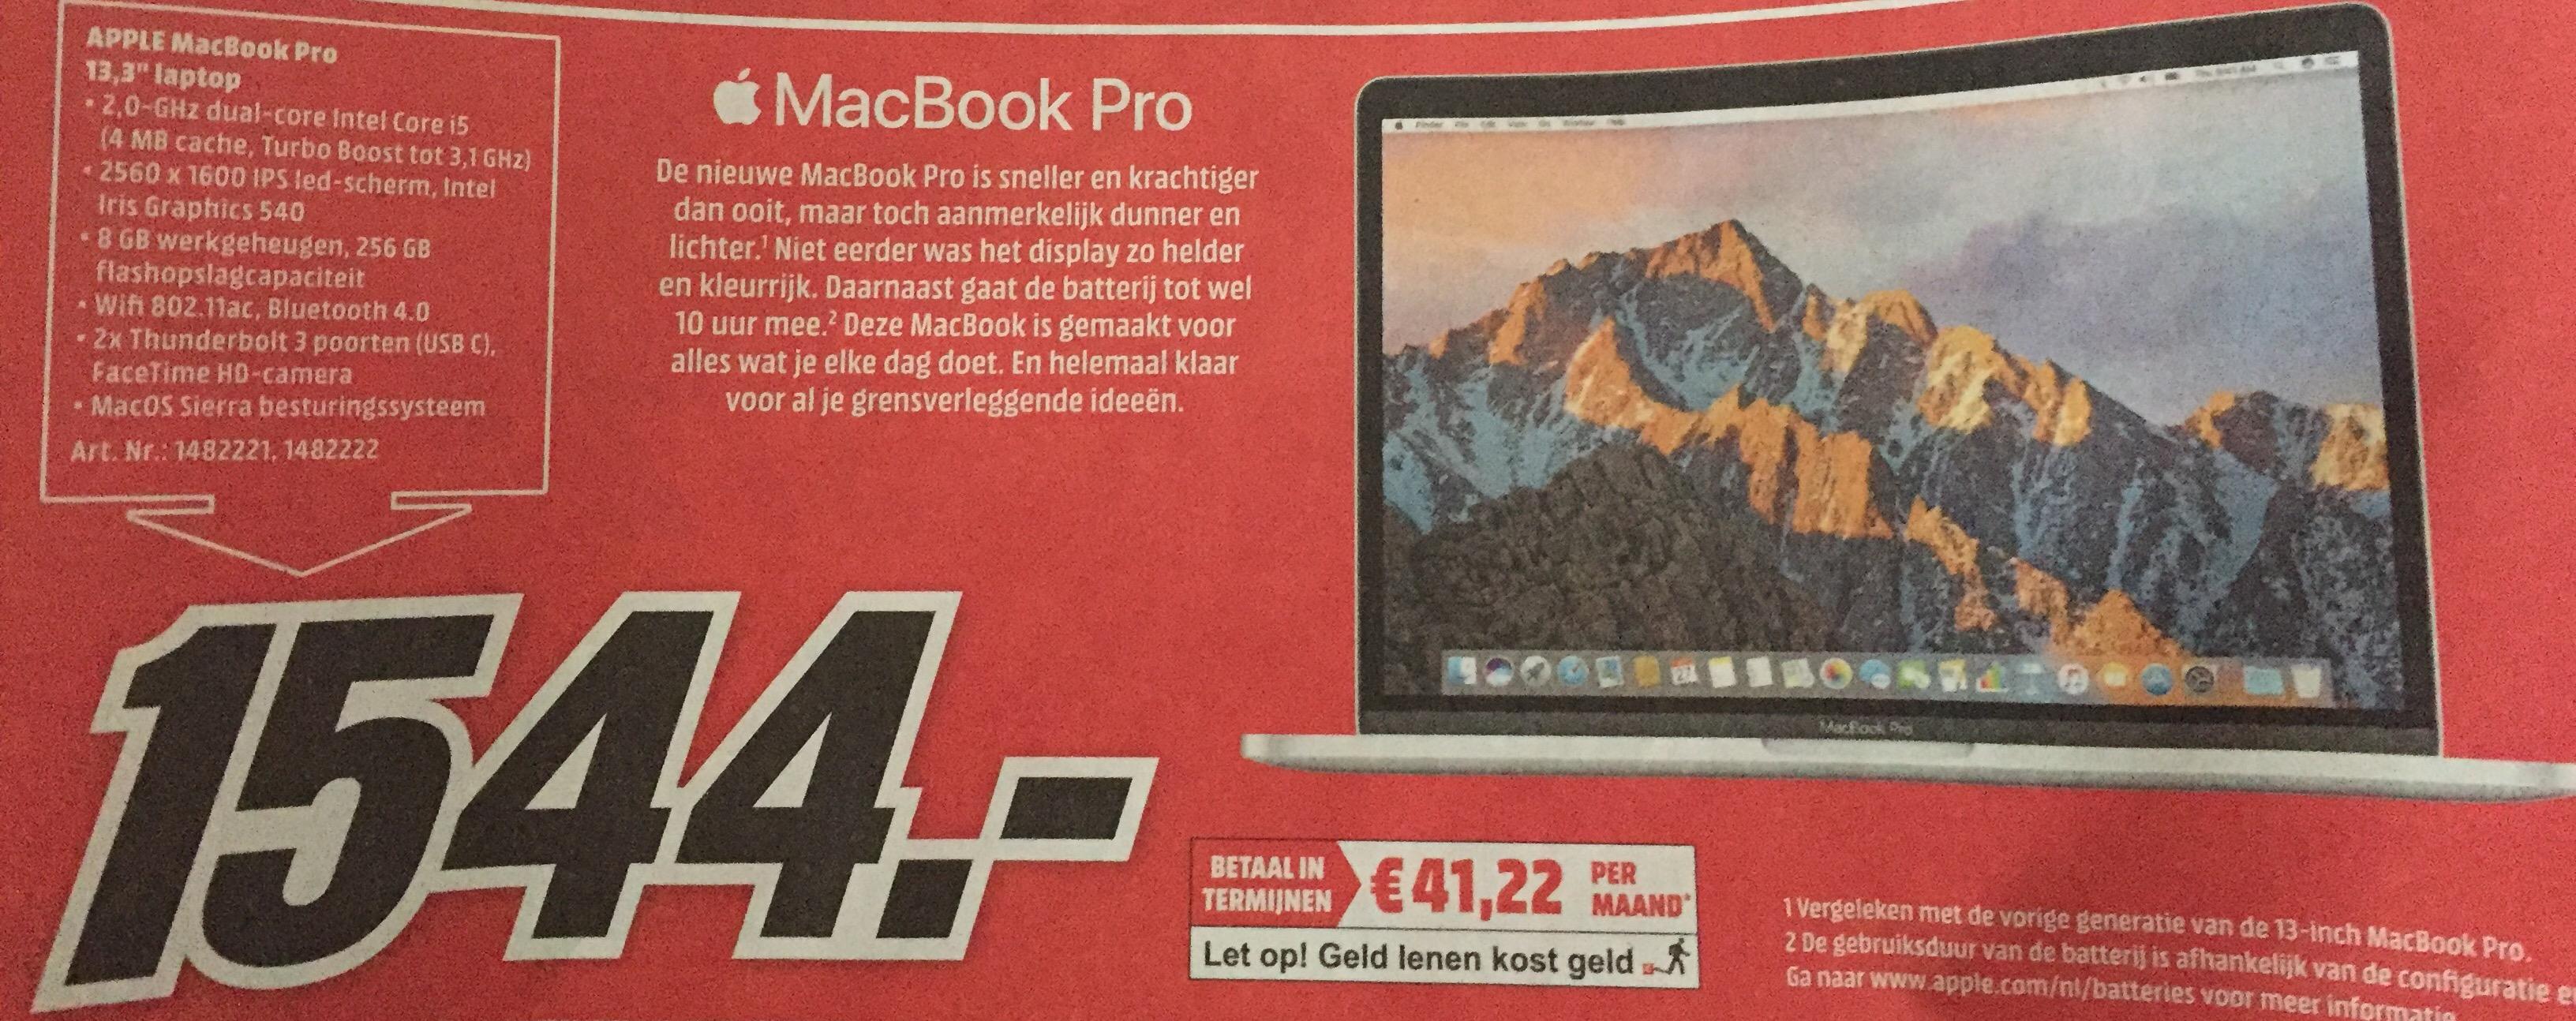 [Macbook Pro] Late 2016 Model zonder Touchbar MediaMarkt